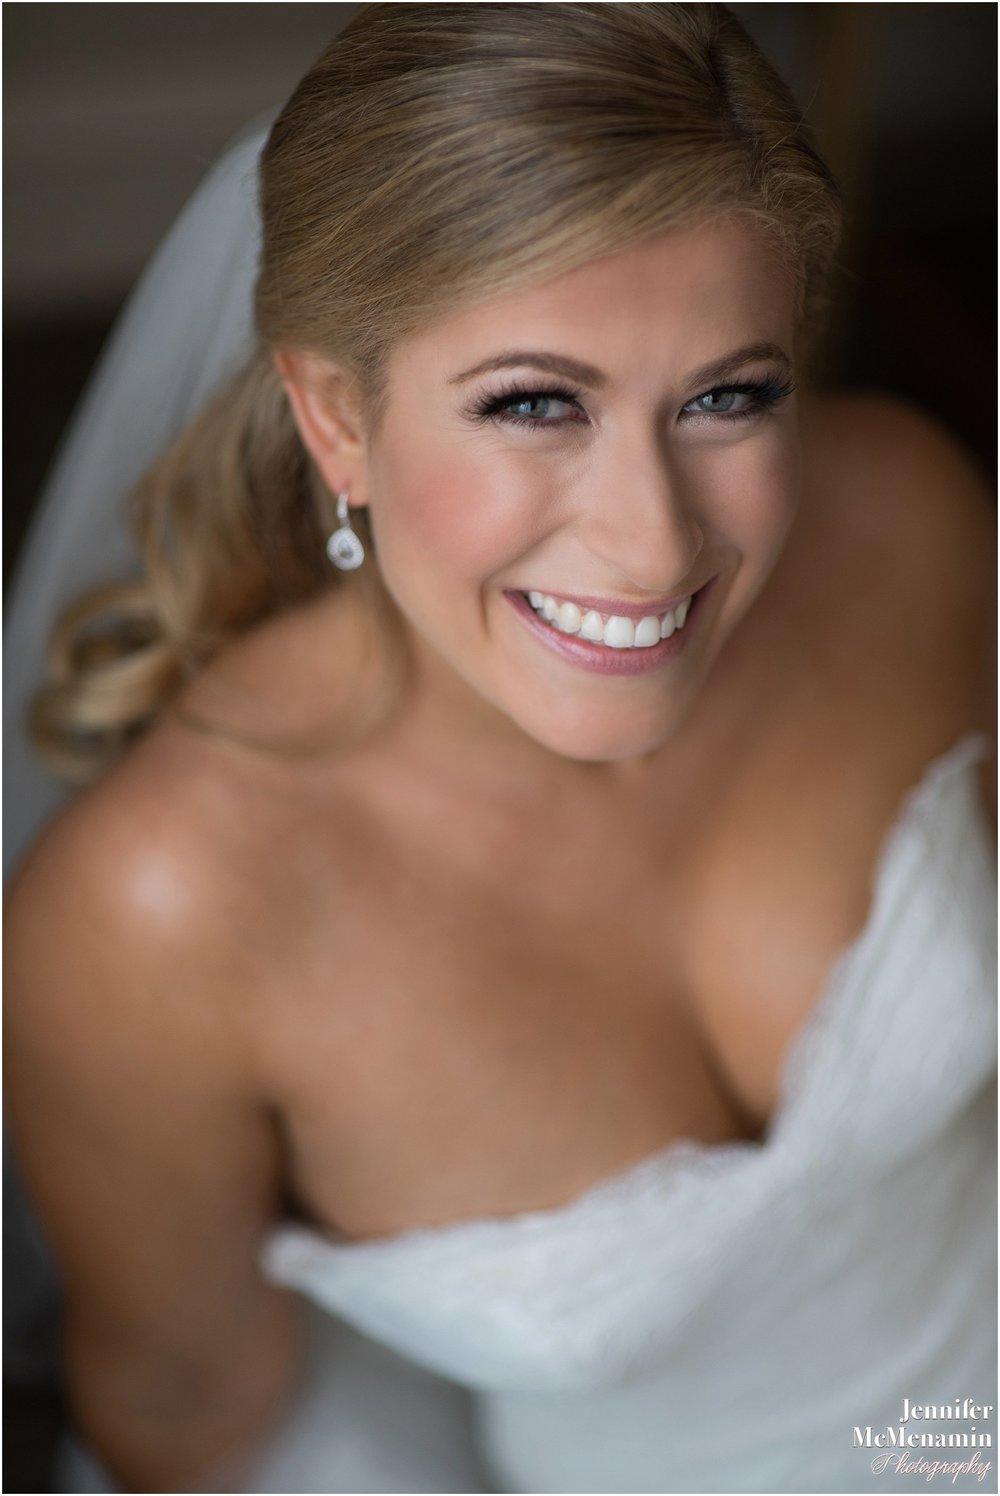 Courtney Framm AR BH _00847-00170_Jennifer-McMenamin-Photography-Royal-Sonesta-Harbor-Court-Hotel-wedding.jpg